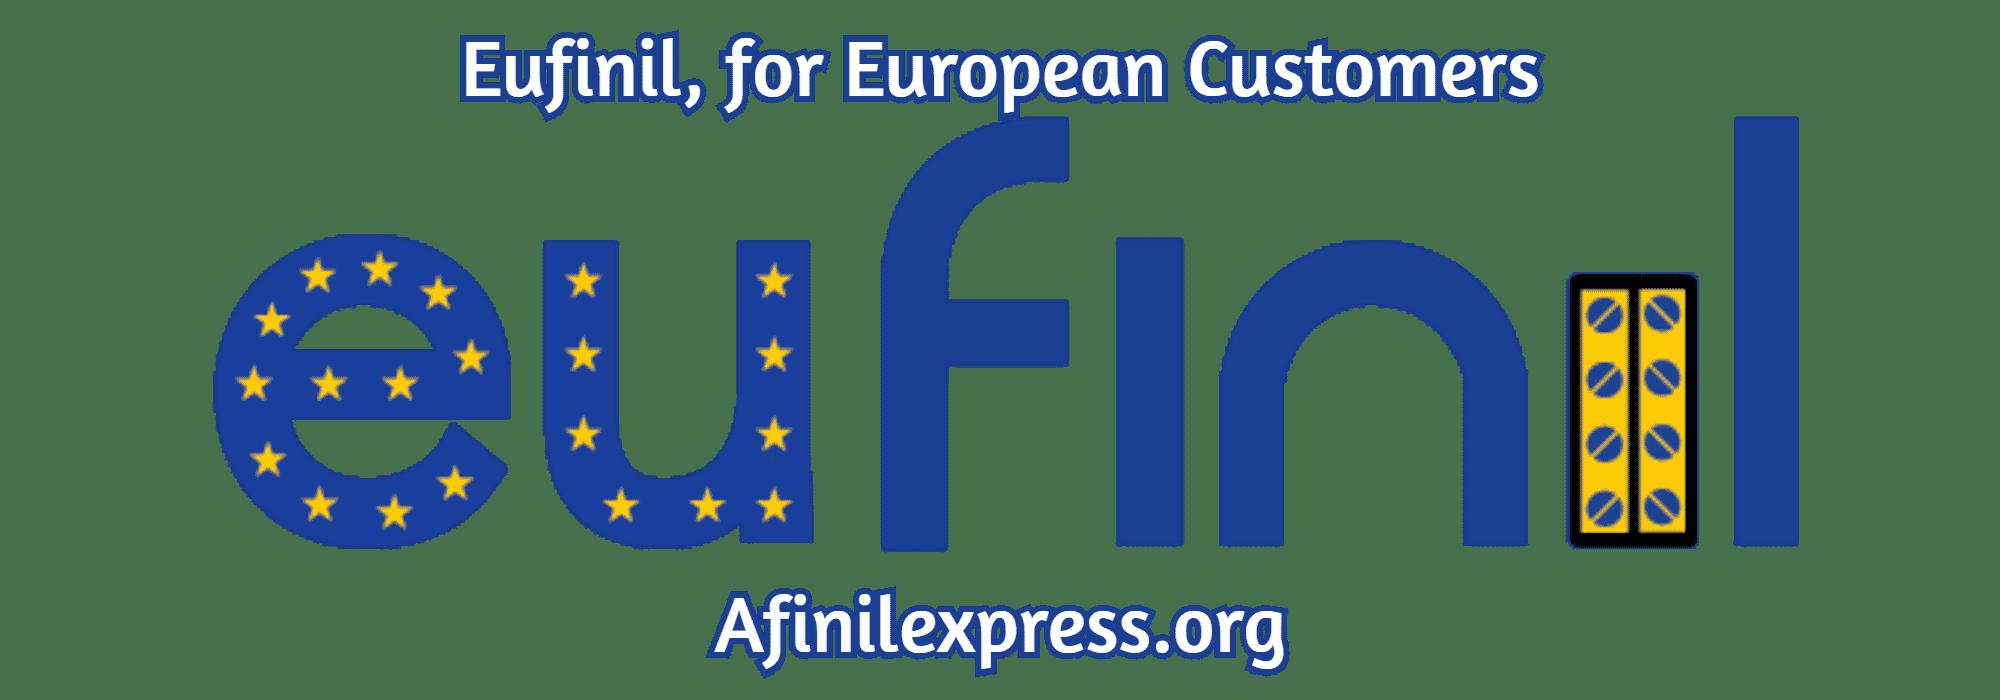 eufinil @ afinilexpress.org